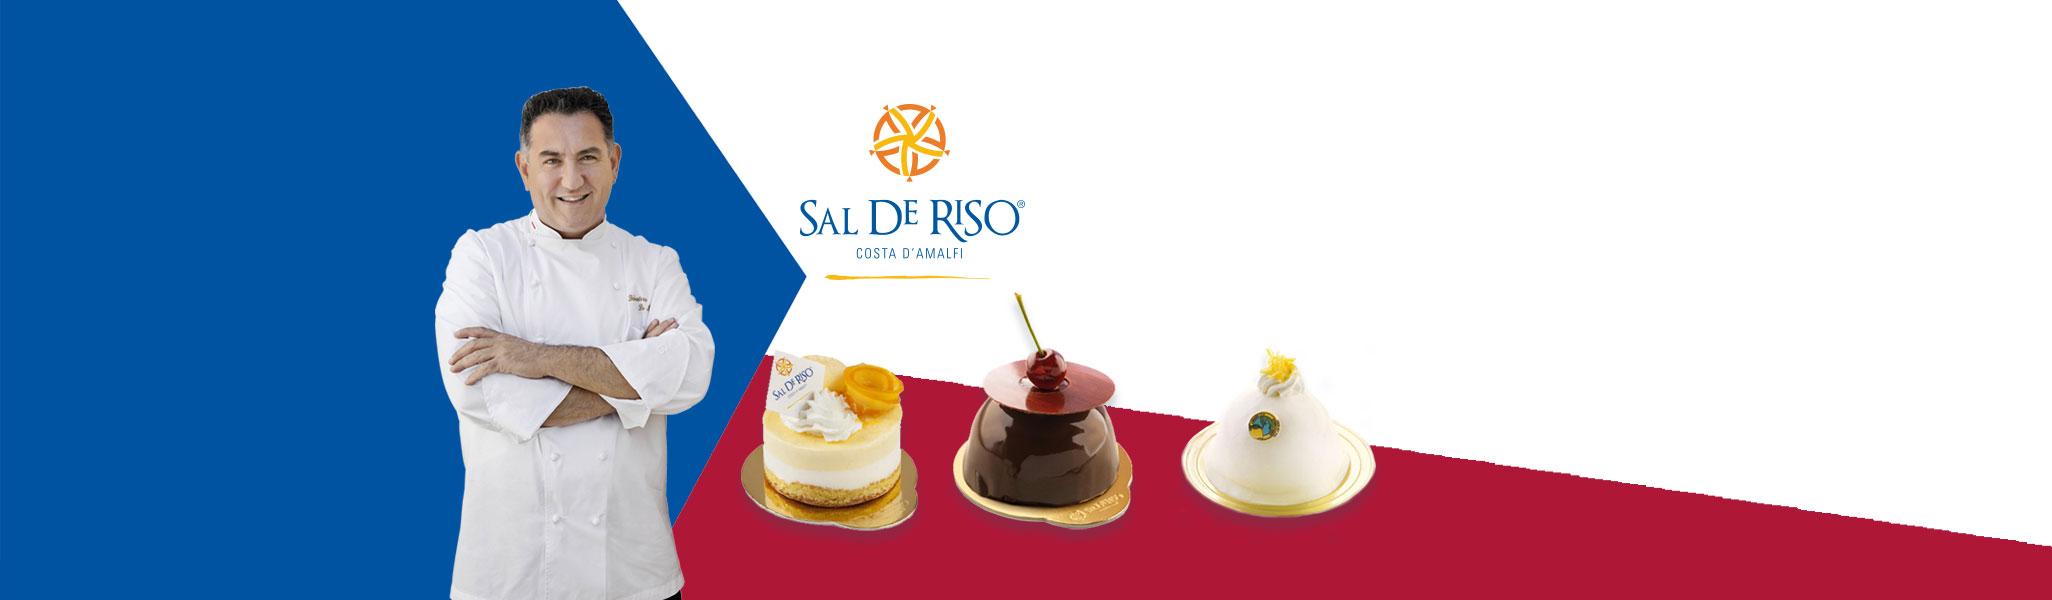 slide_salderiso